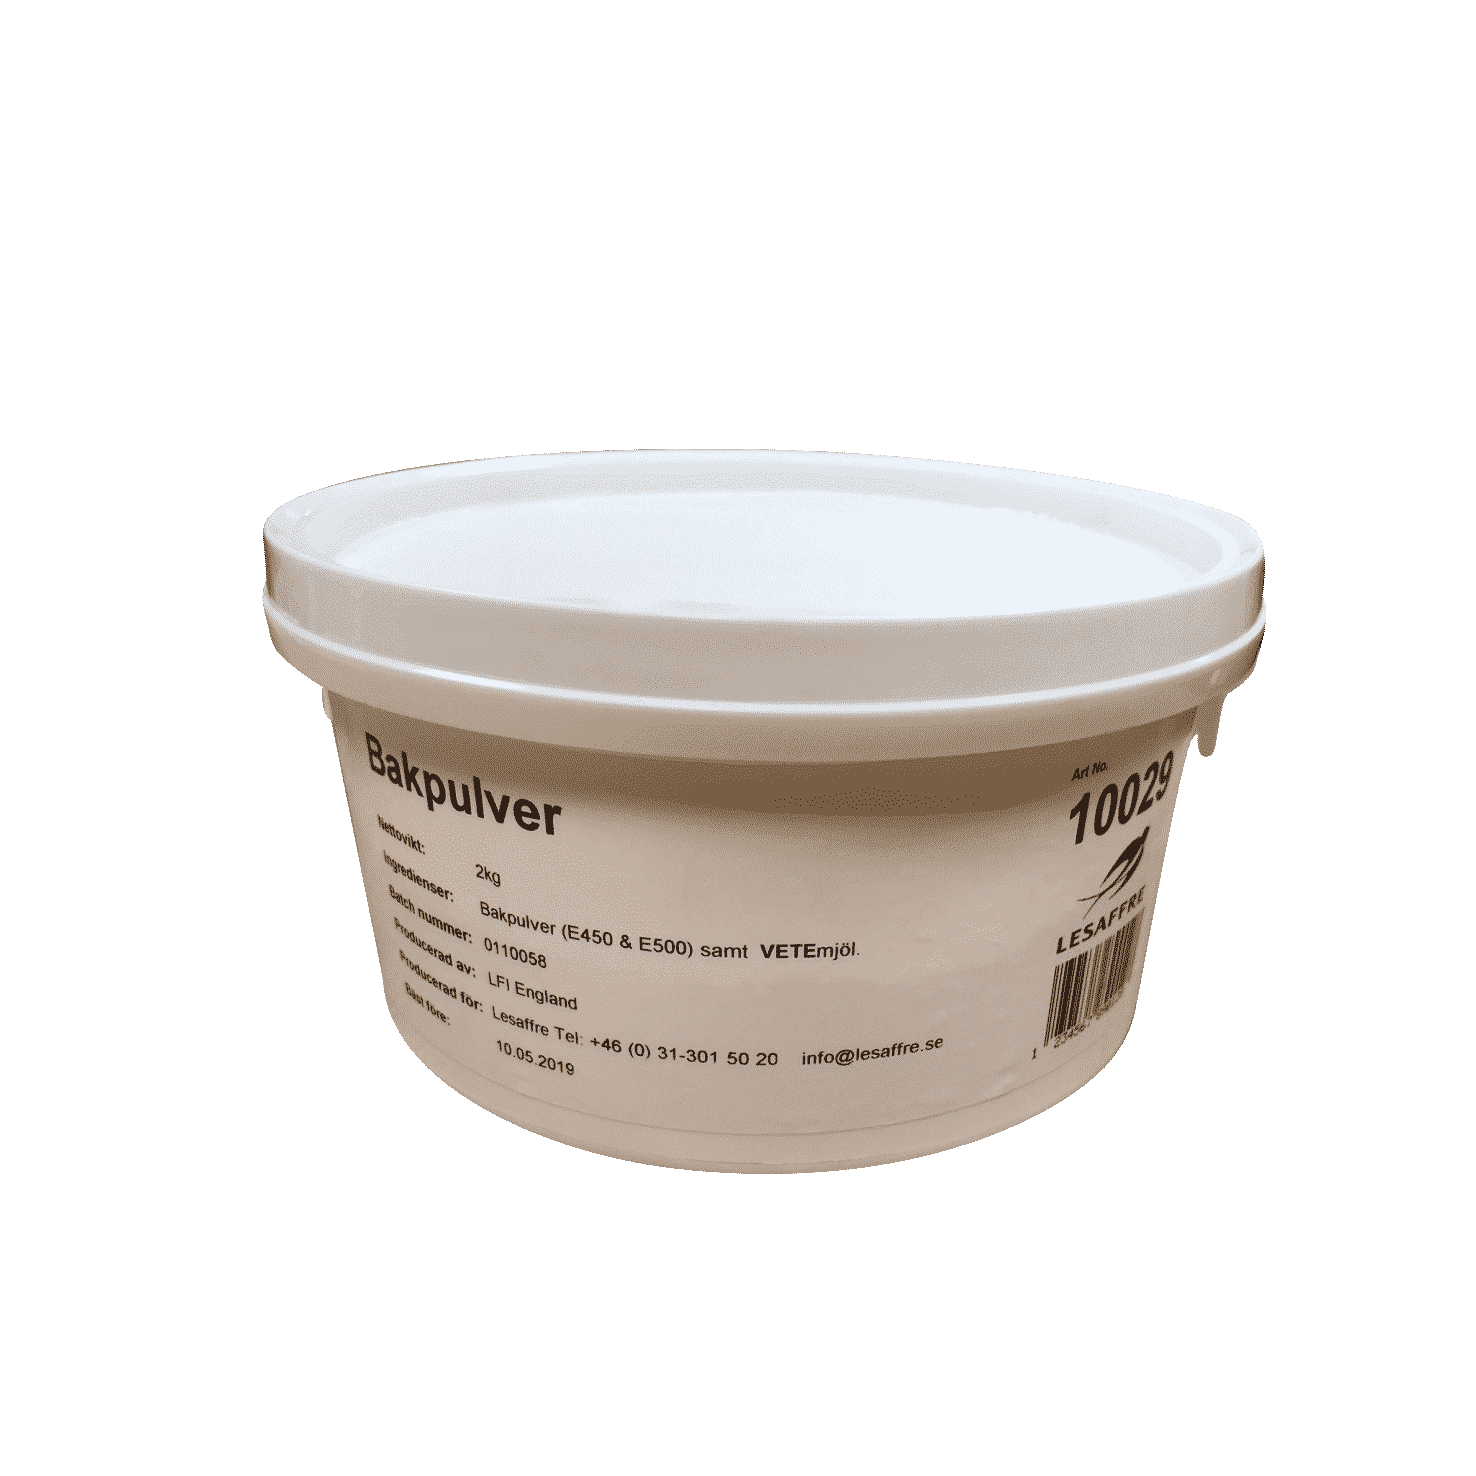 bakingpowder_2kg-1920